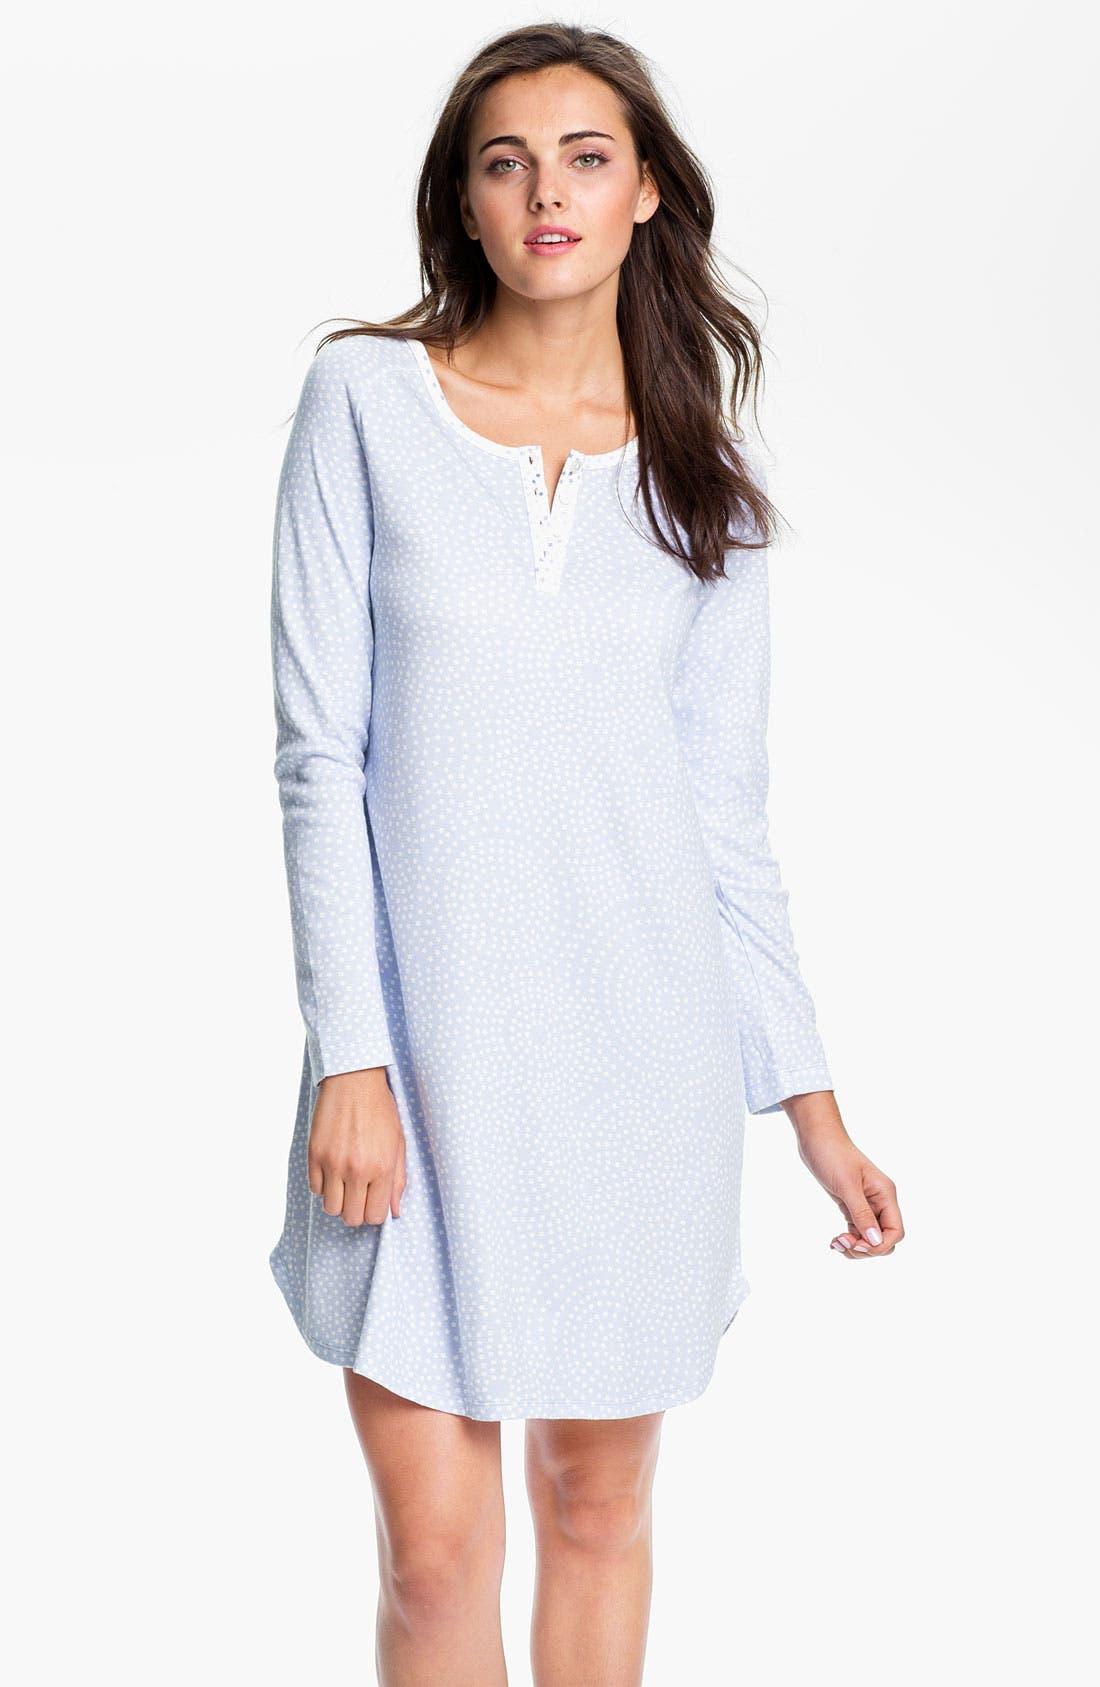 Main Image - Carole Hochman Designs Interlock Knit Sleep Shirt